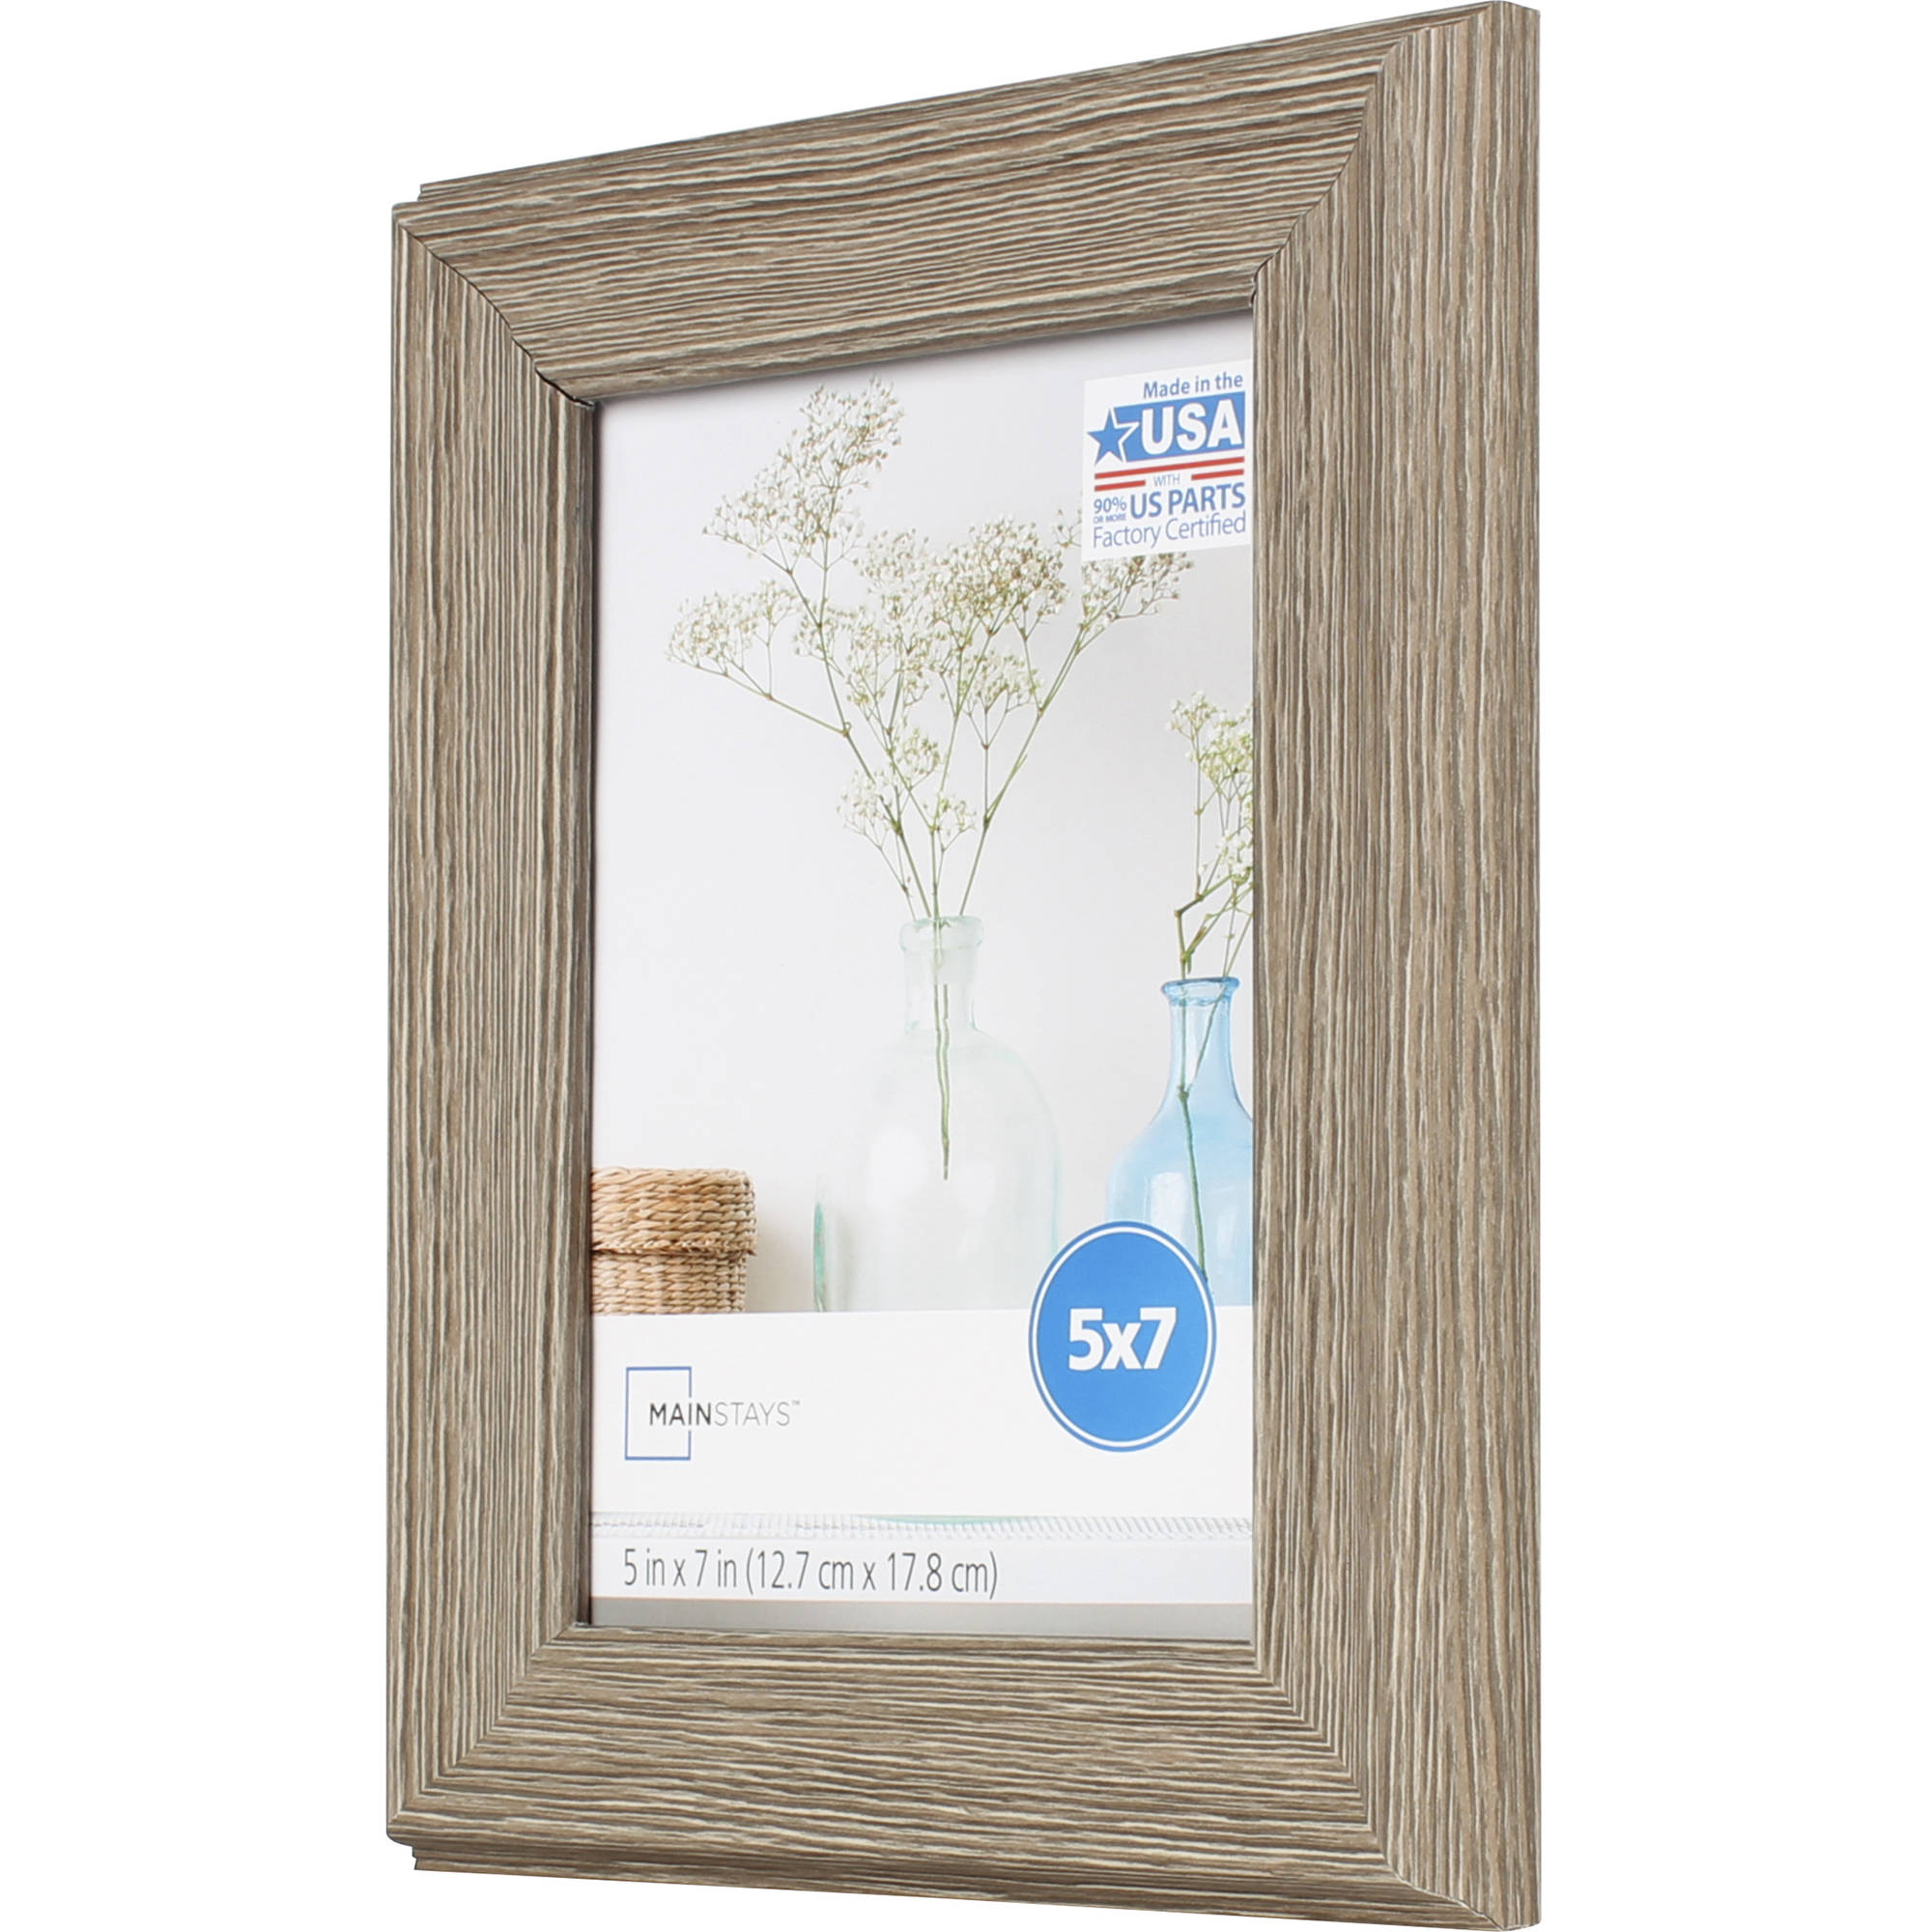 "6/""x 4/"" 15.24 x 10.16 cm  WALNUT Modern Wooden Picture Frames"